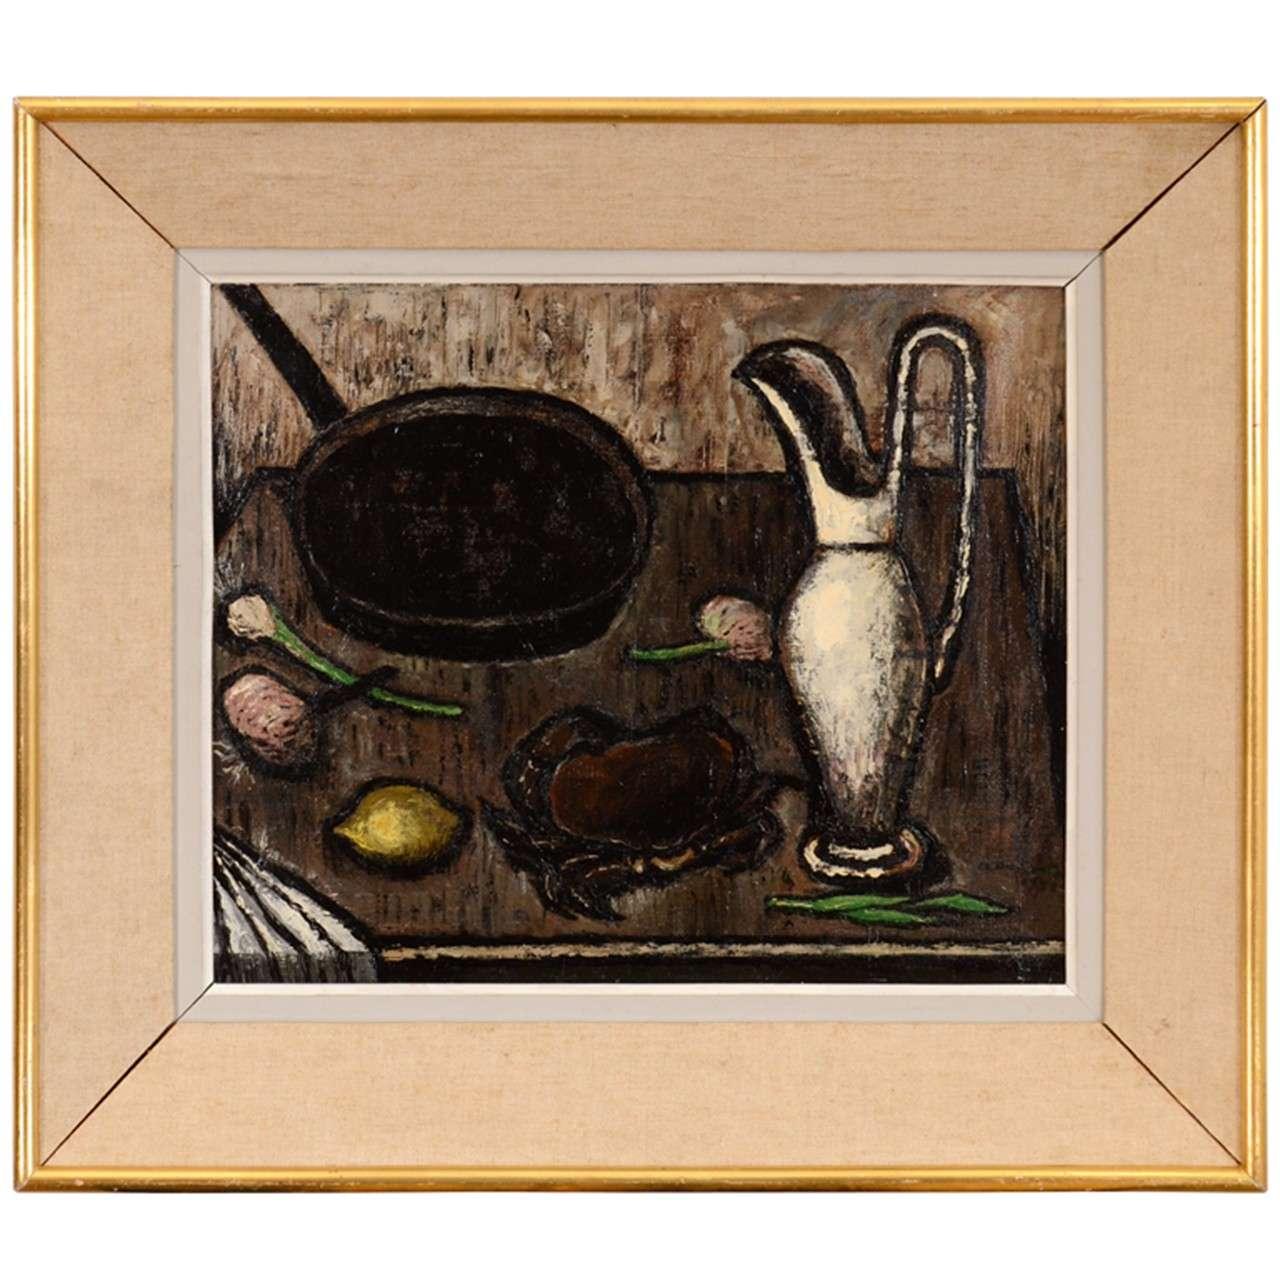 Framed Still Life Oil Painting by A. Duranton 1